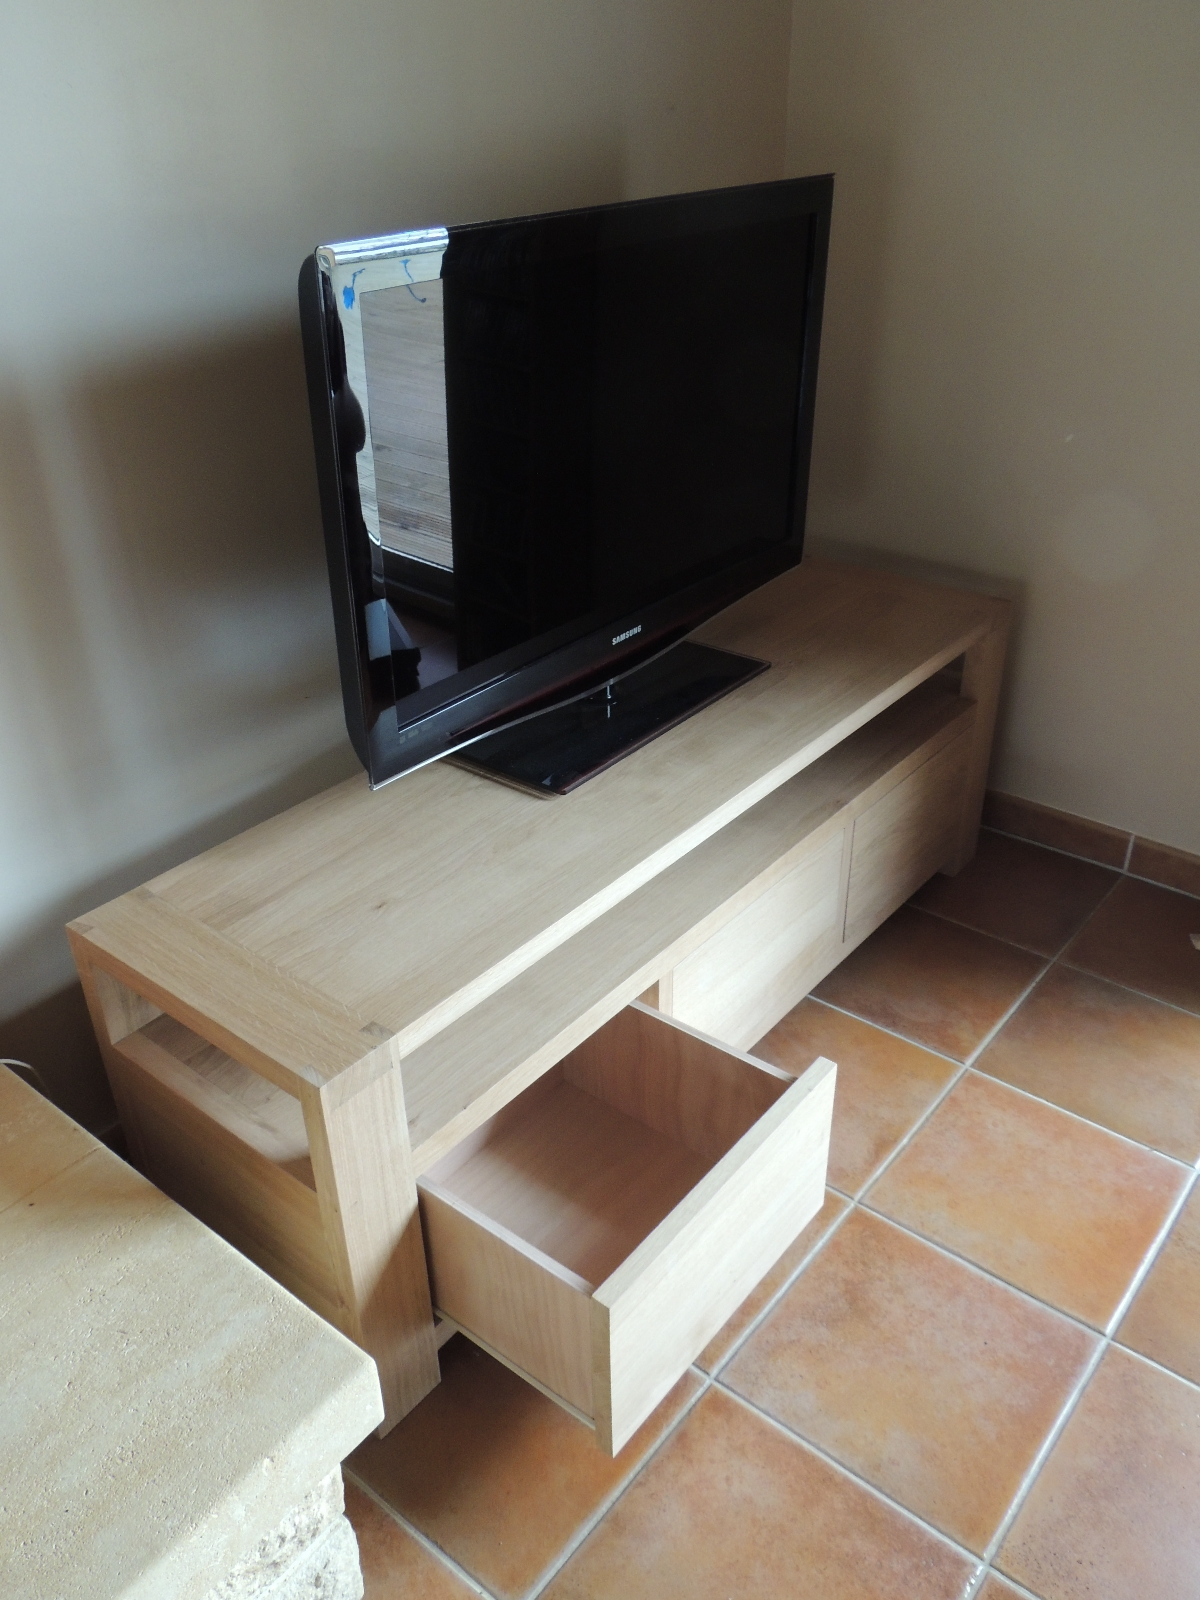 Meuble Tv Anglais Meuble Tv Blanc Arrondi U2013 Artzein Com  # Meuble Tv Anglais